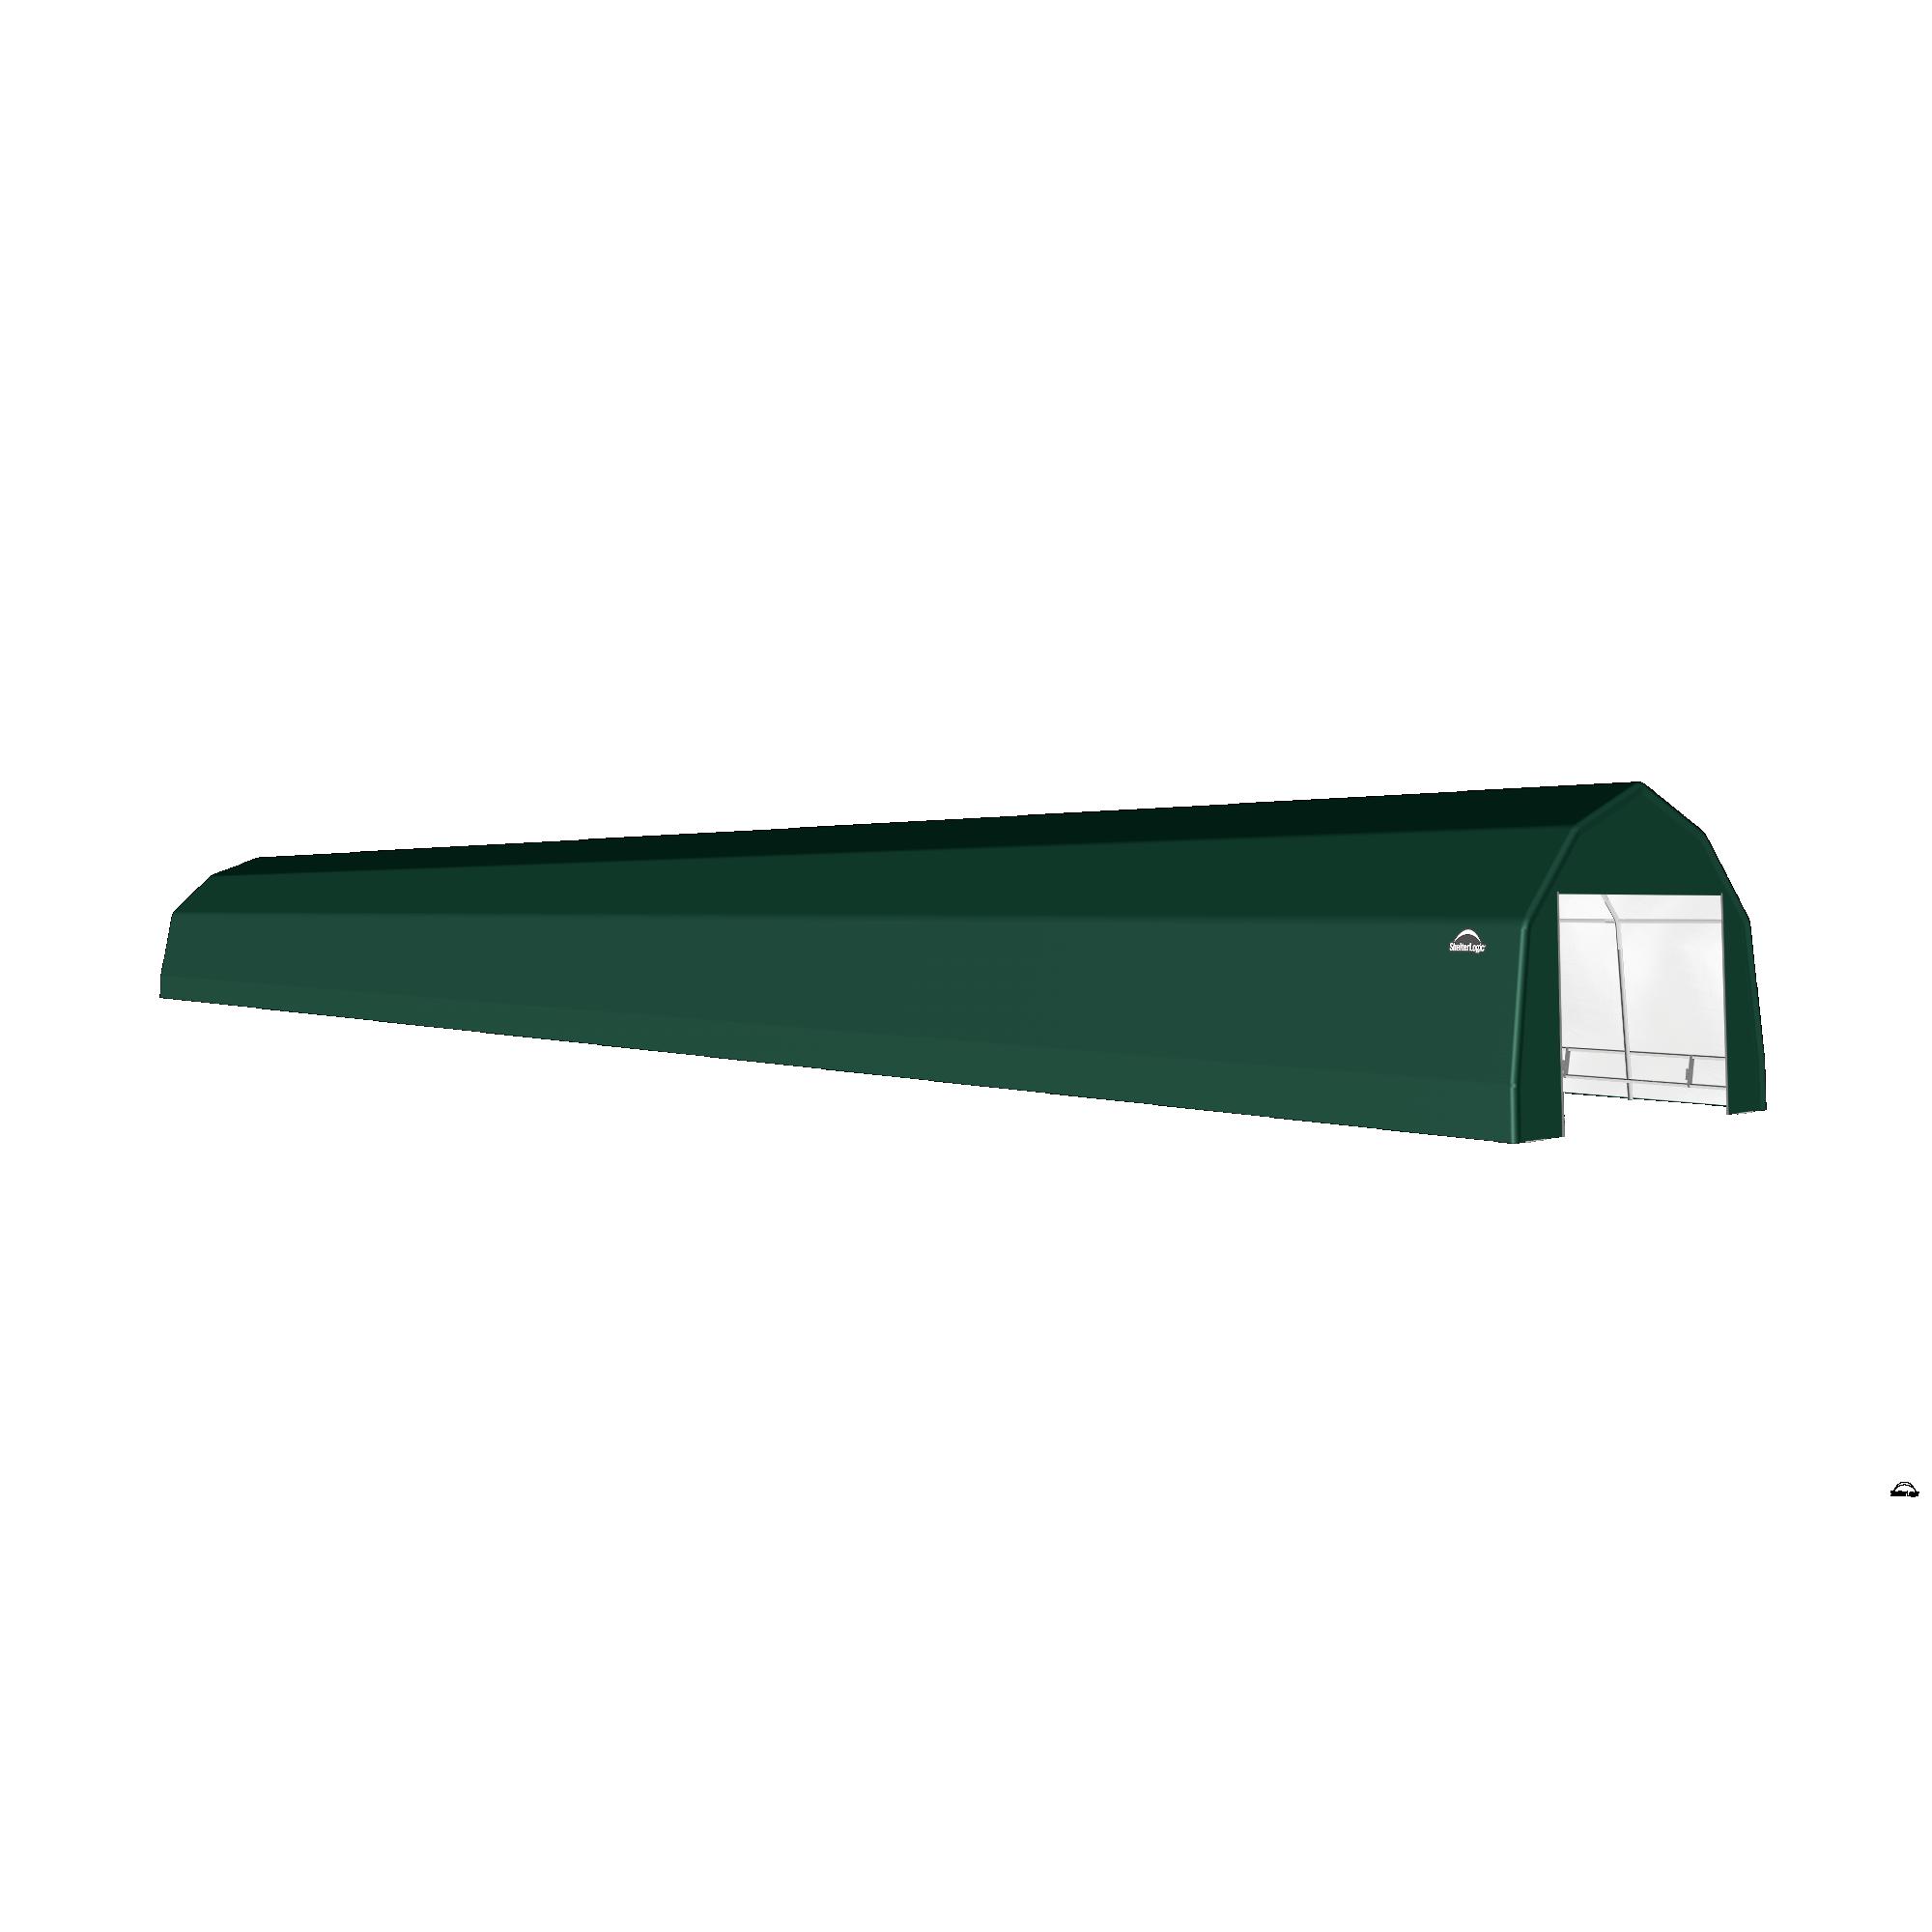 SP Barn 12X92X9 Green 14 oz PE Shelter